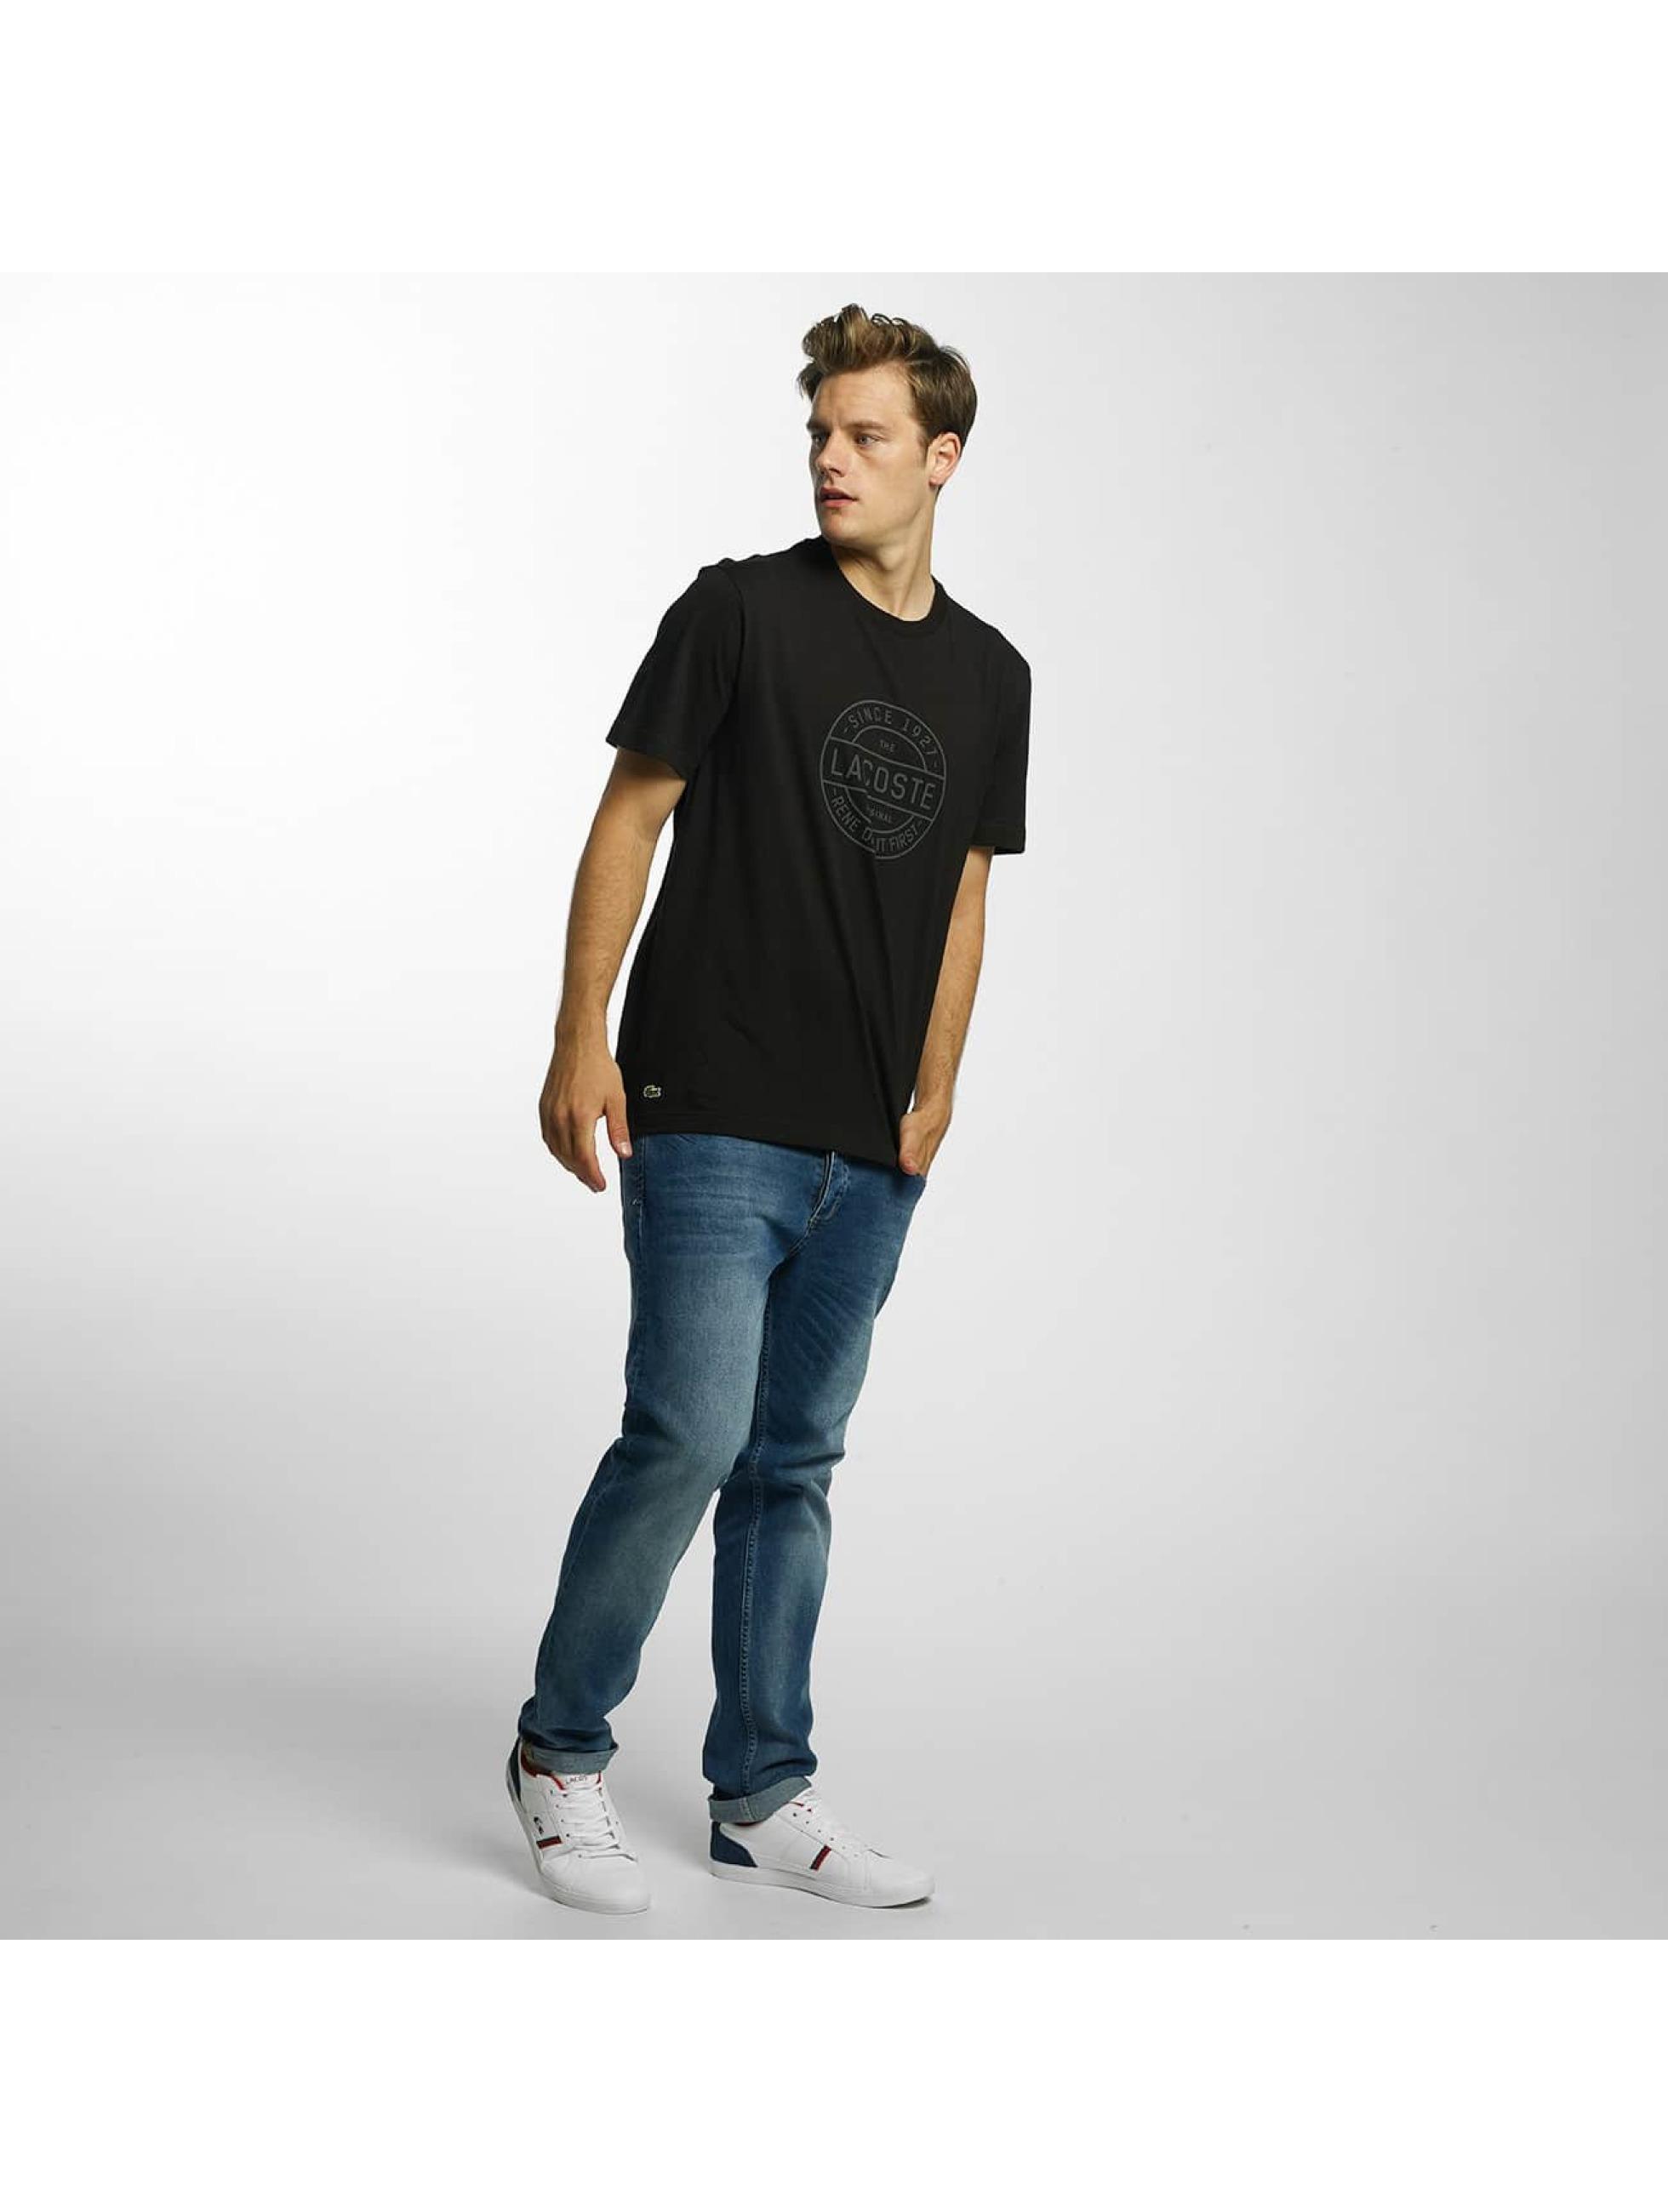 Lacoste Classic T-Shirt Original black